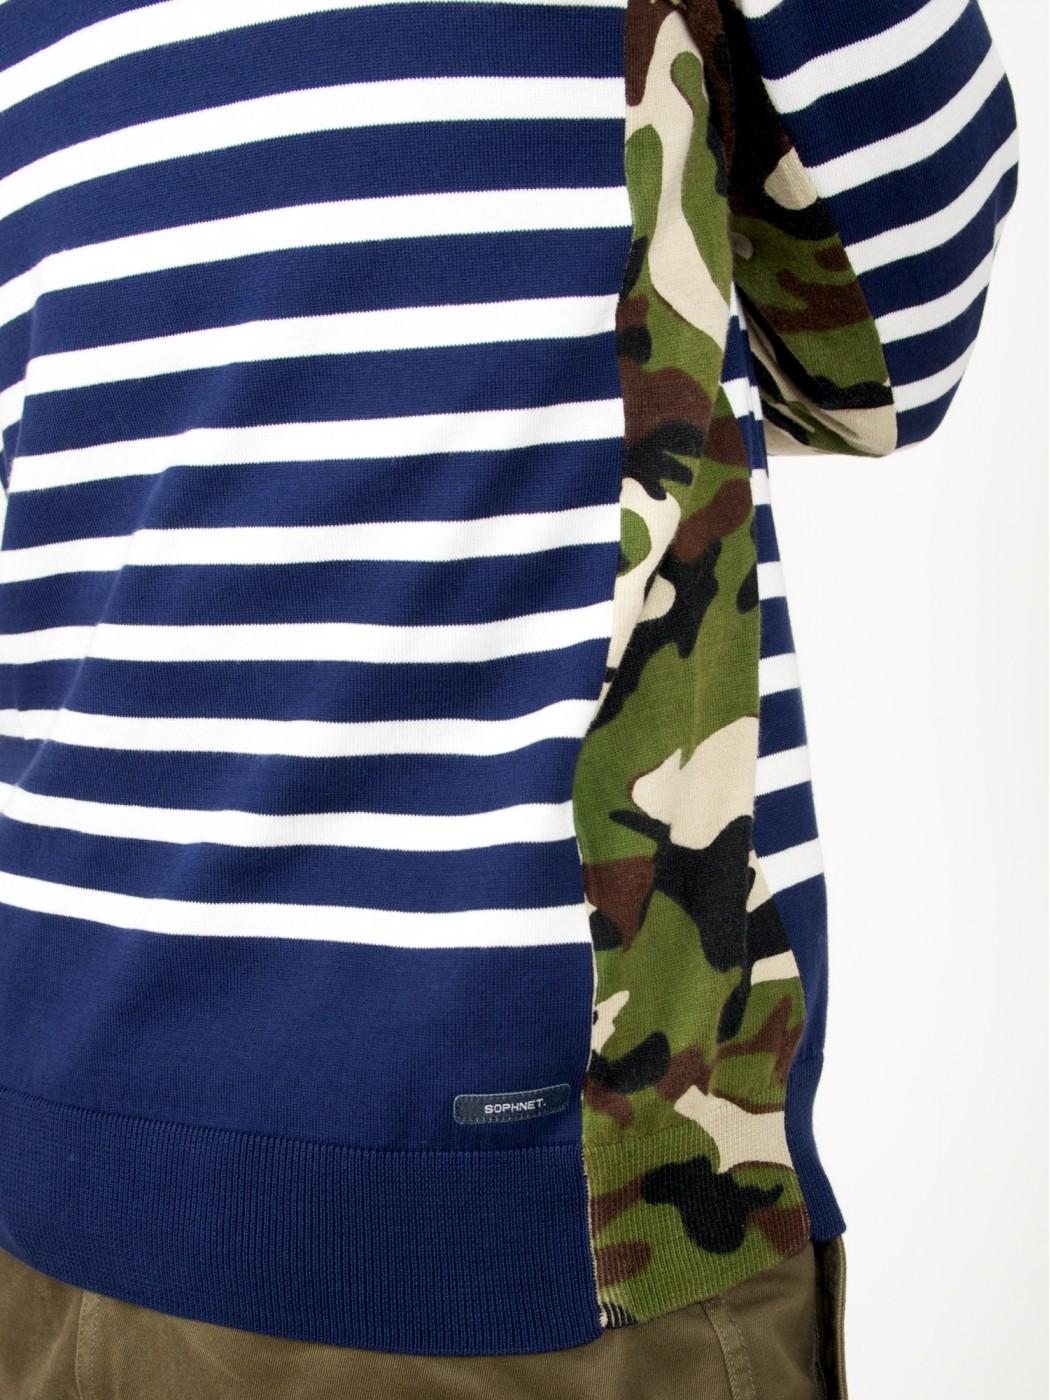 -side-panel-camo-border-crew-neck-knit-navy2